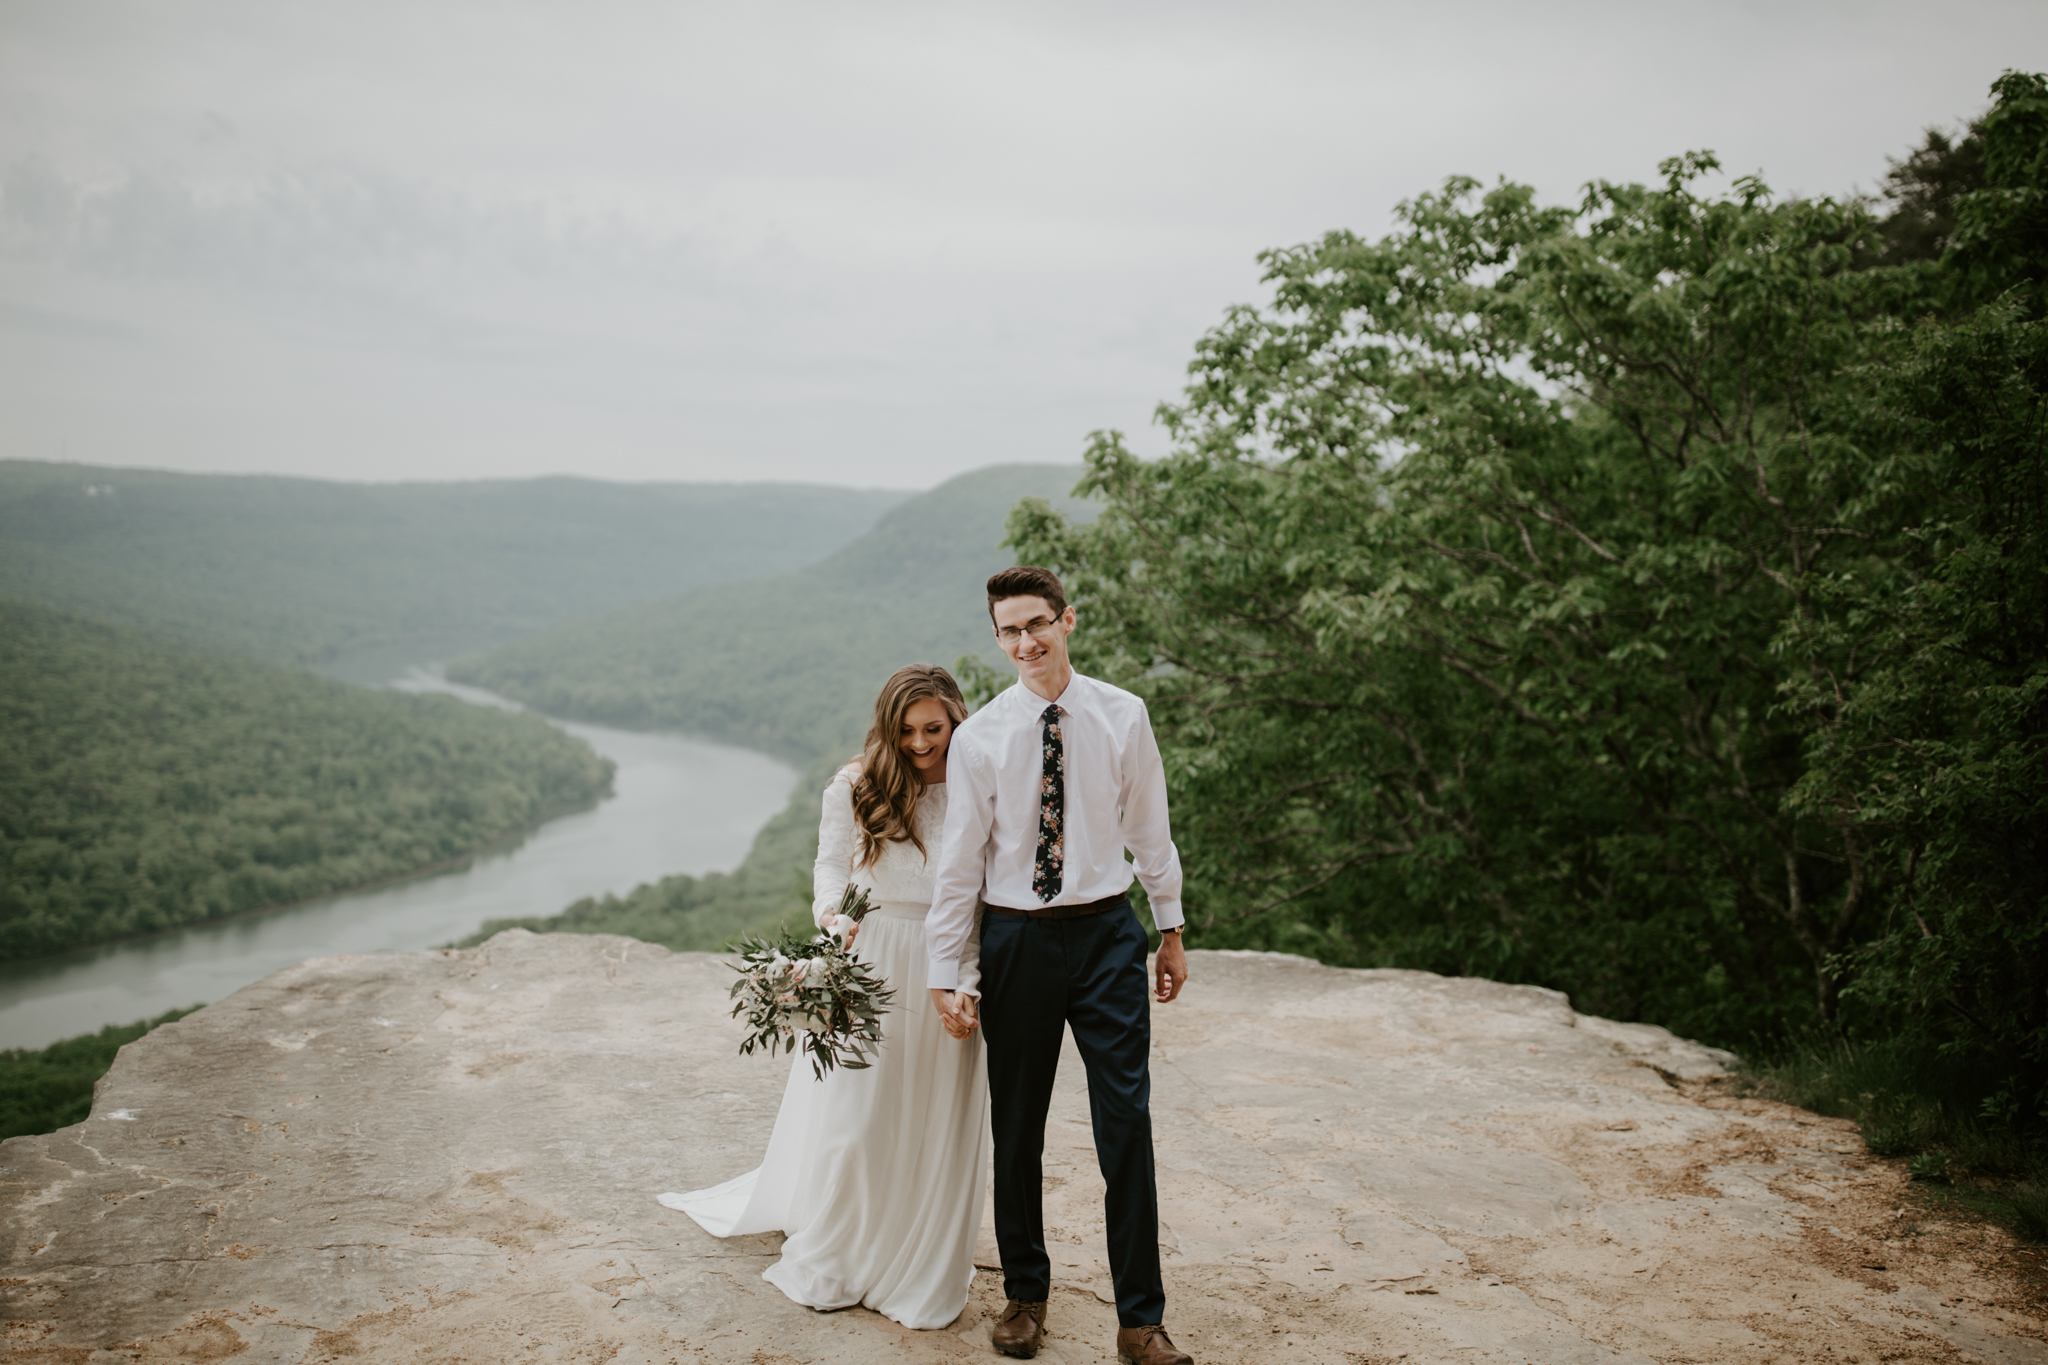 Lacey-Joe-Chattanooga-Nashville-Tennessee-Wedding-Elopement-Photographer-14.jpg